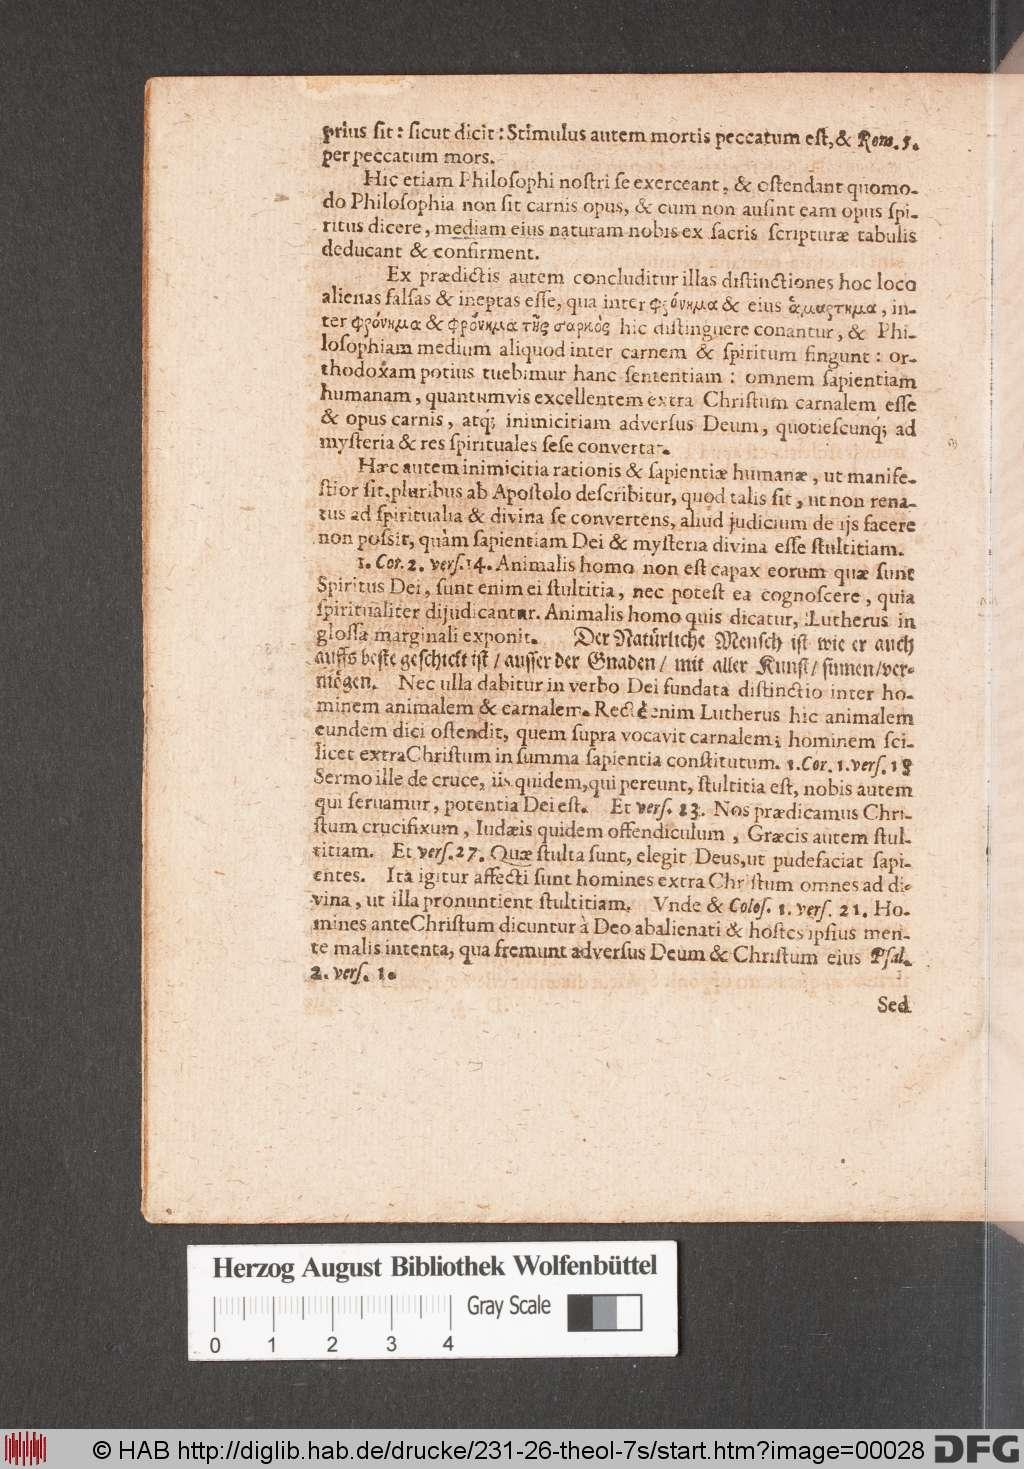 http://diglib.hab.de/drucke/231-26-theol-7s/00028.jpg